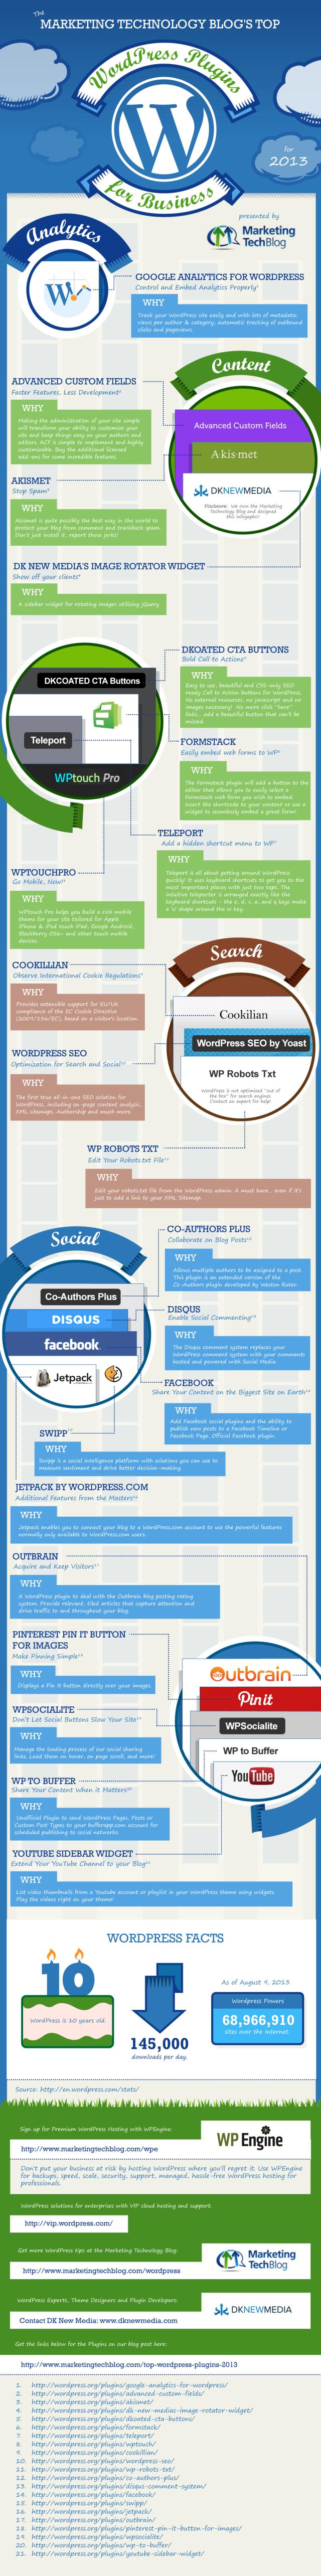 mejores plugin de wordpress para empresas 2013